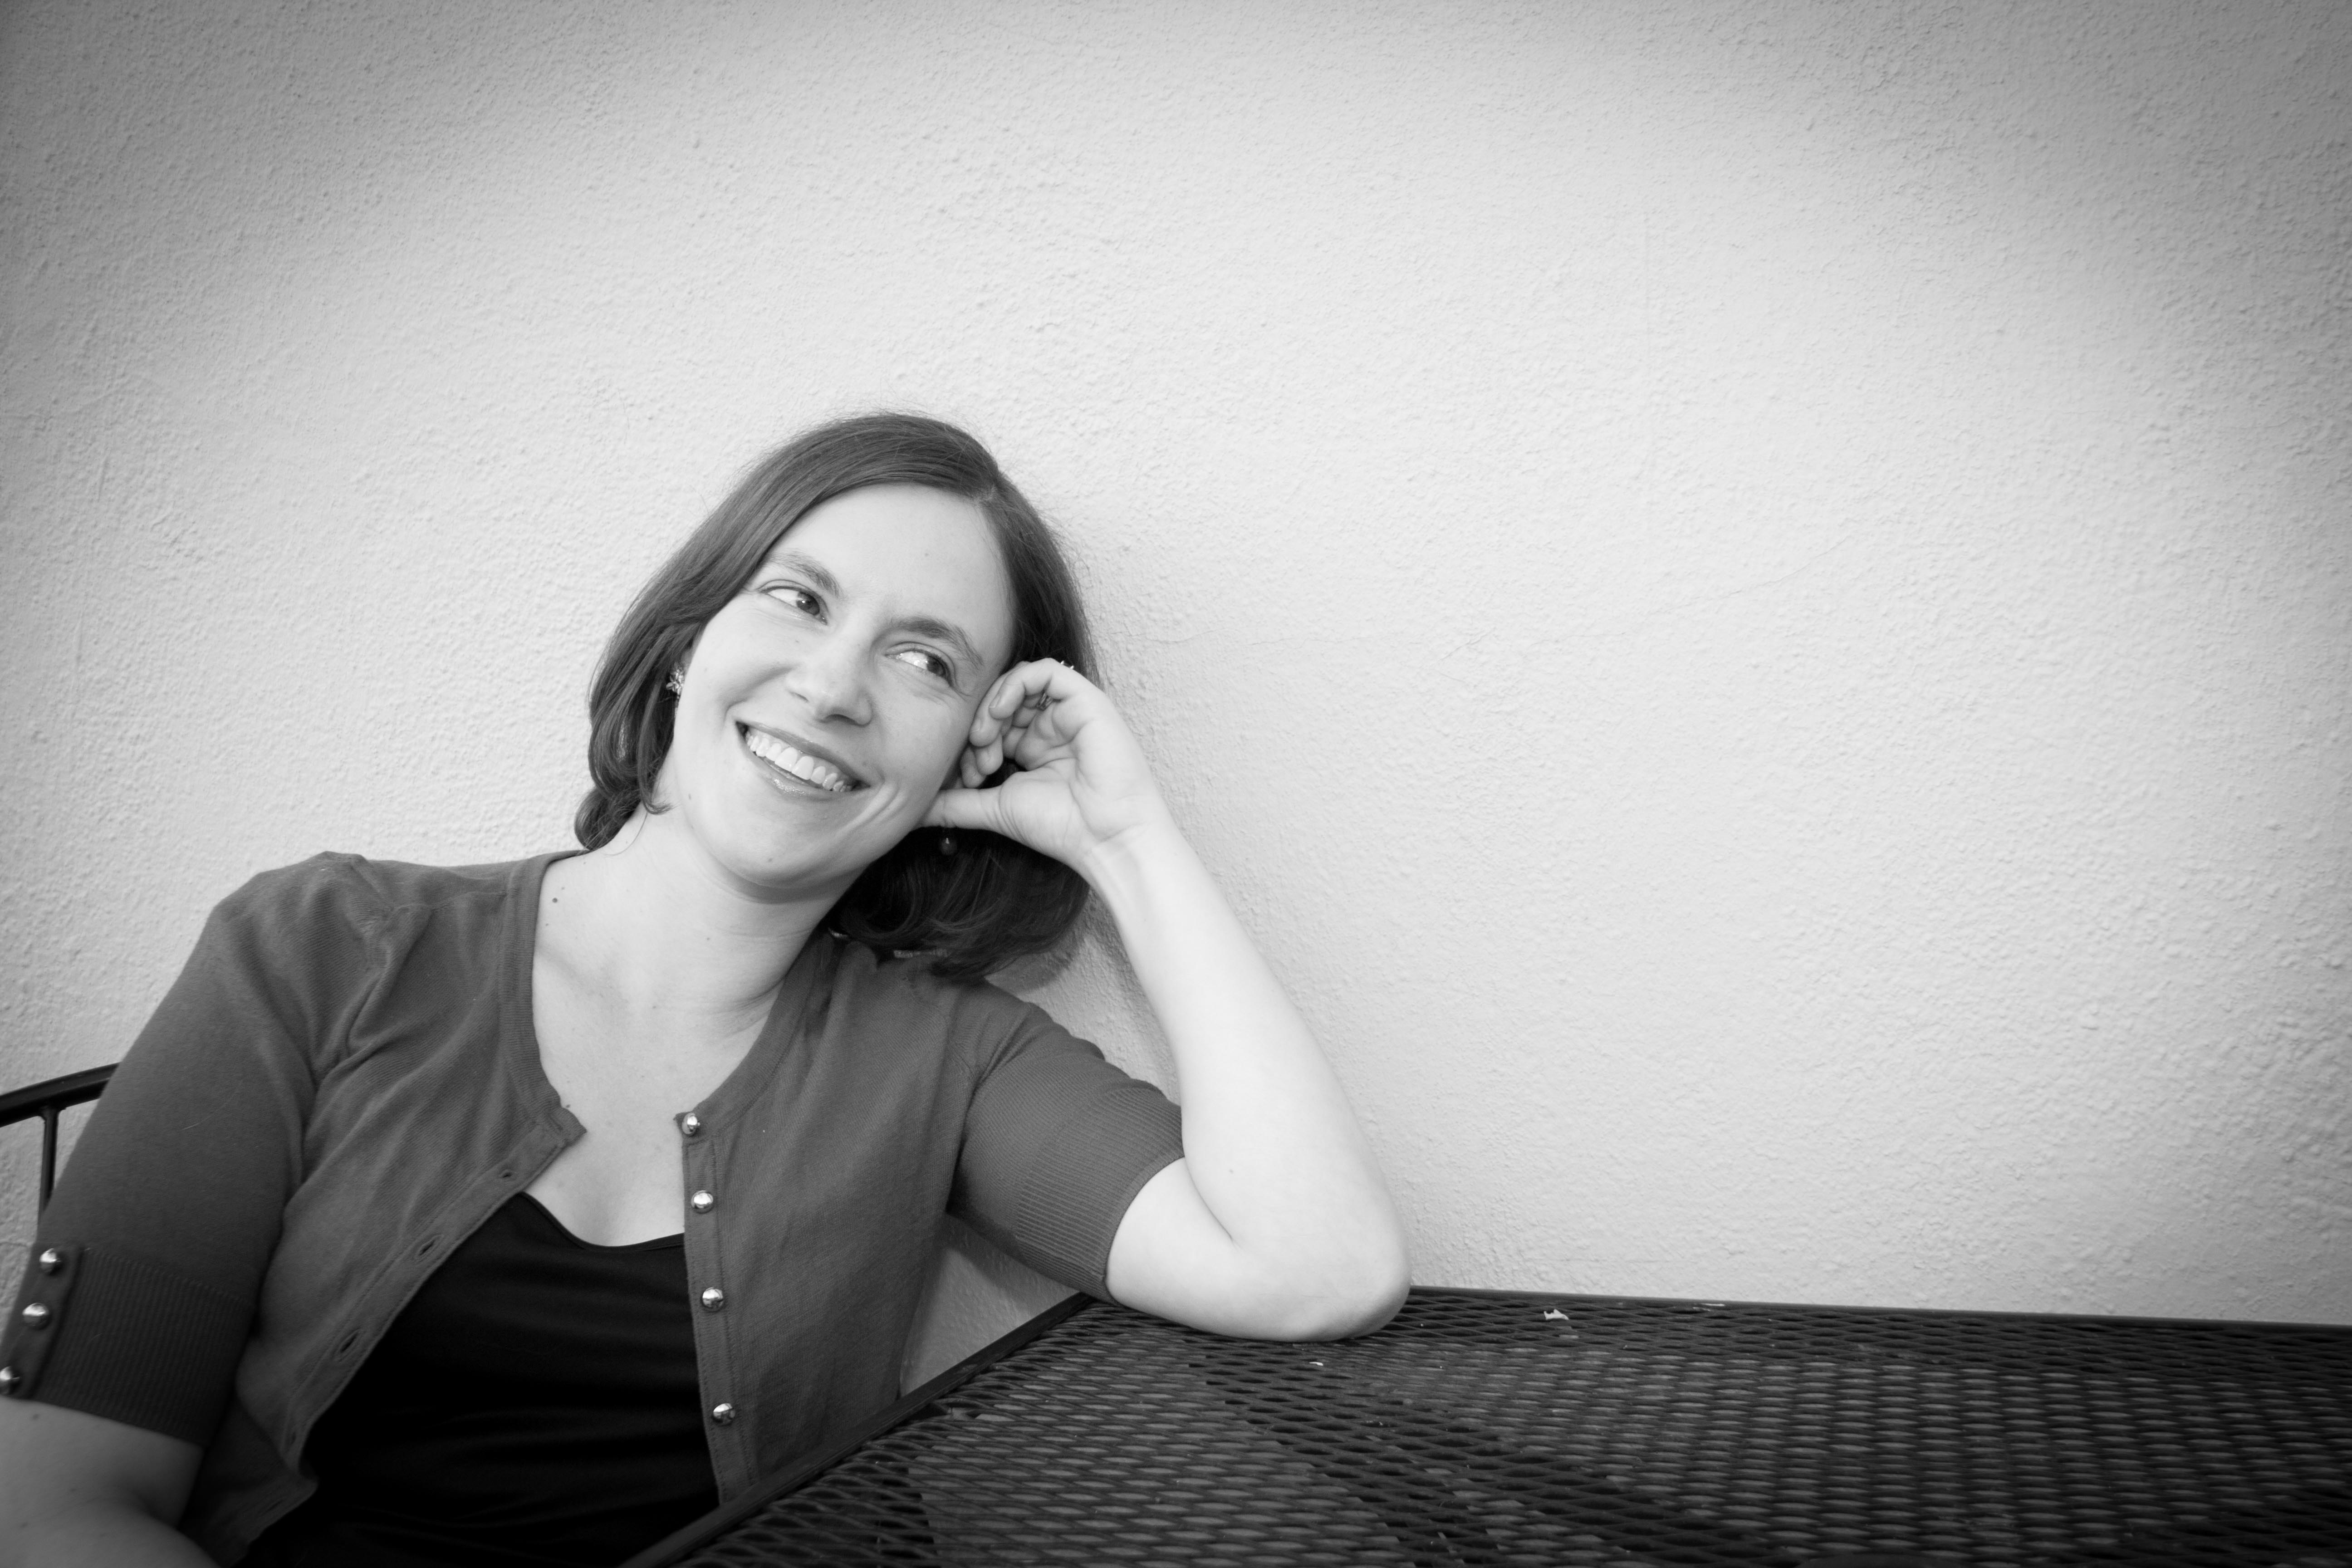 Blog Tour: The Stars of Summer by Tara Dairman